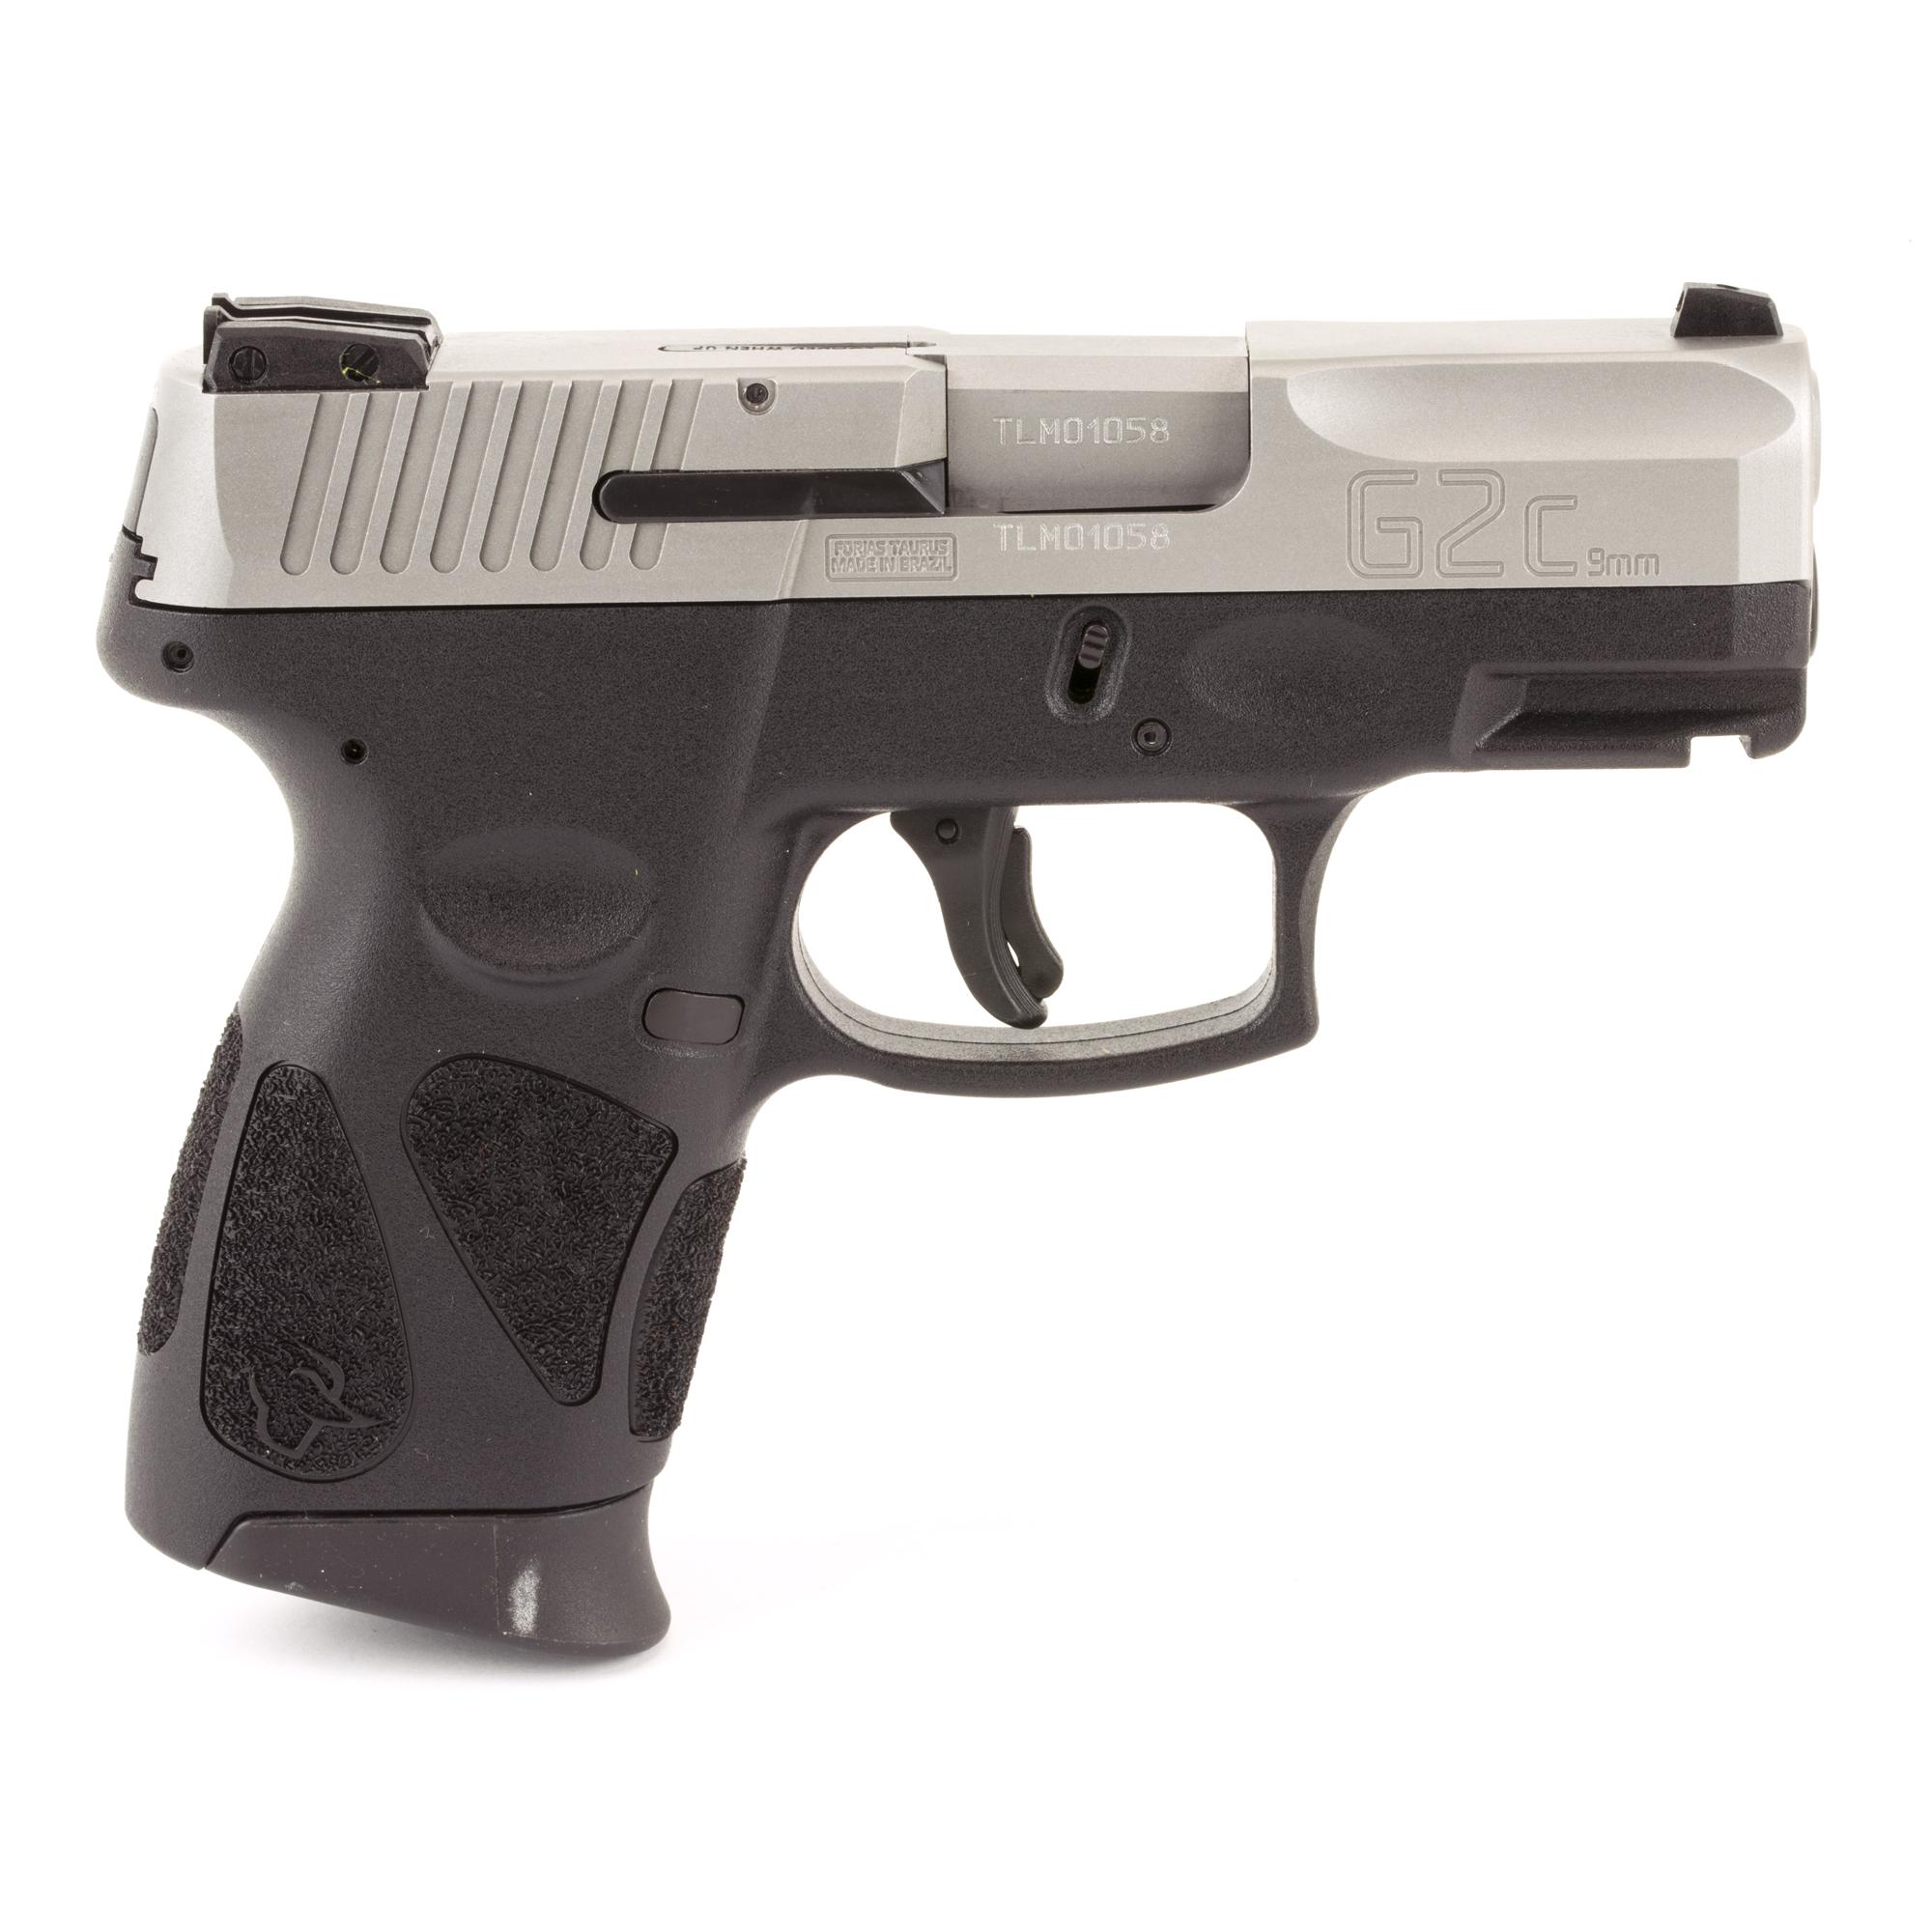 Taurus G2C 40sw · Fast & Free Shipping · DK Firearms